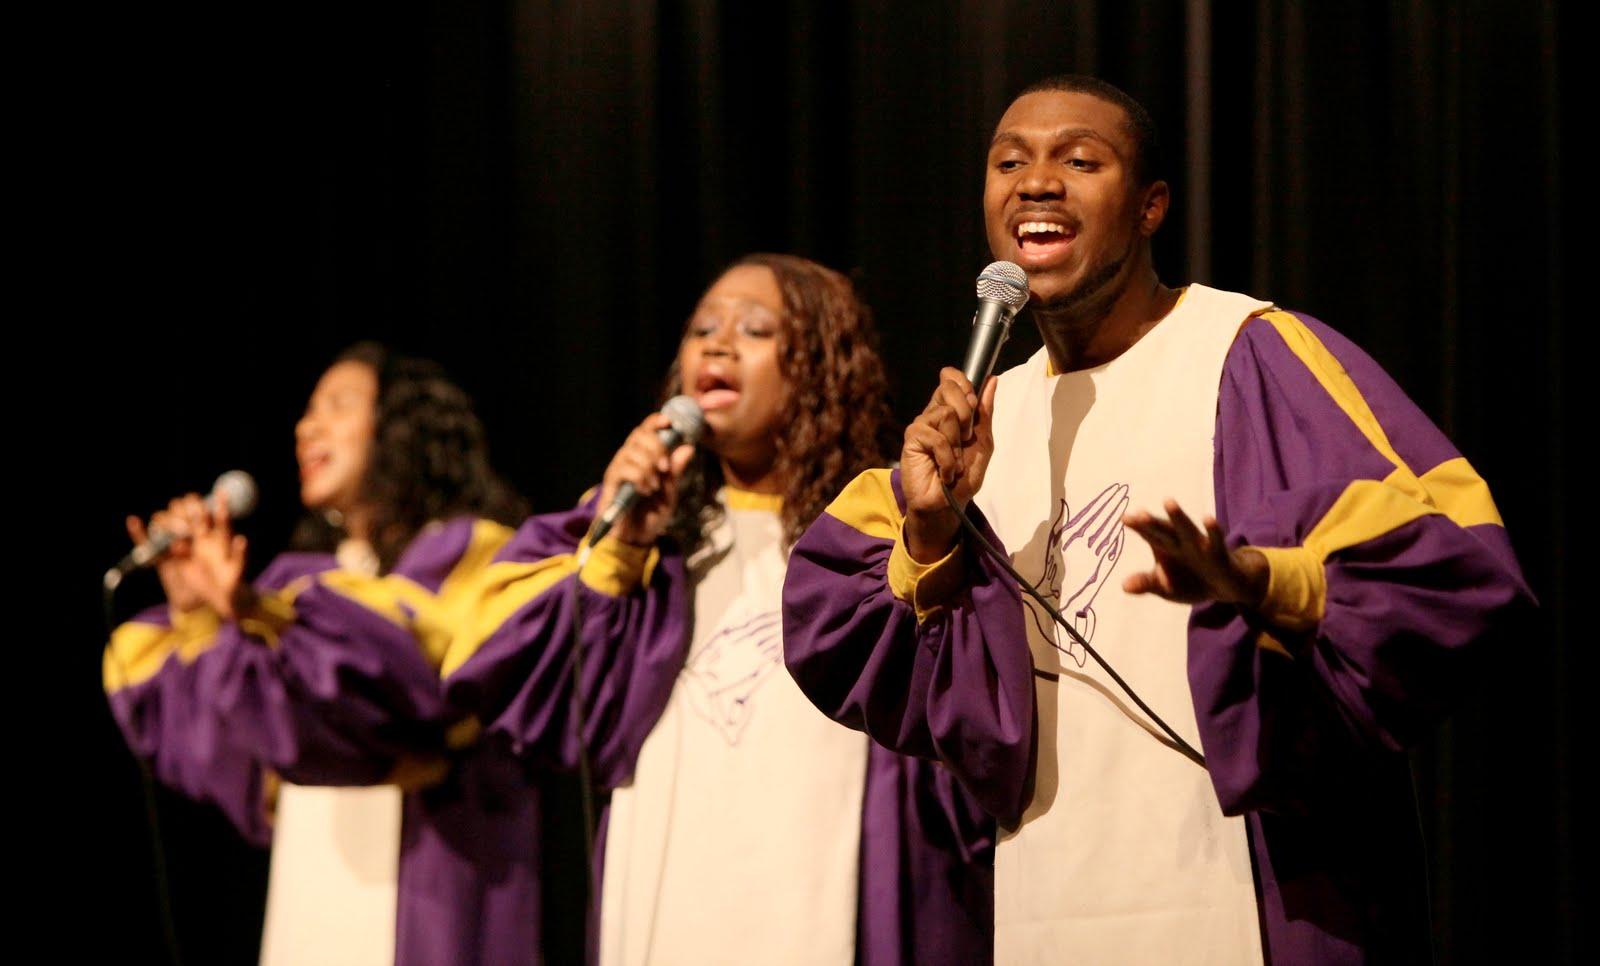 Glory gospel singers live